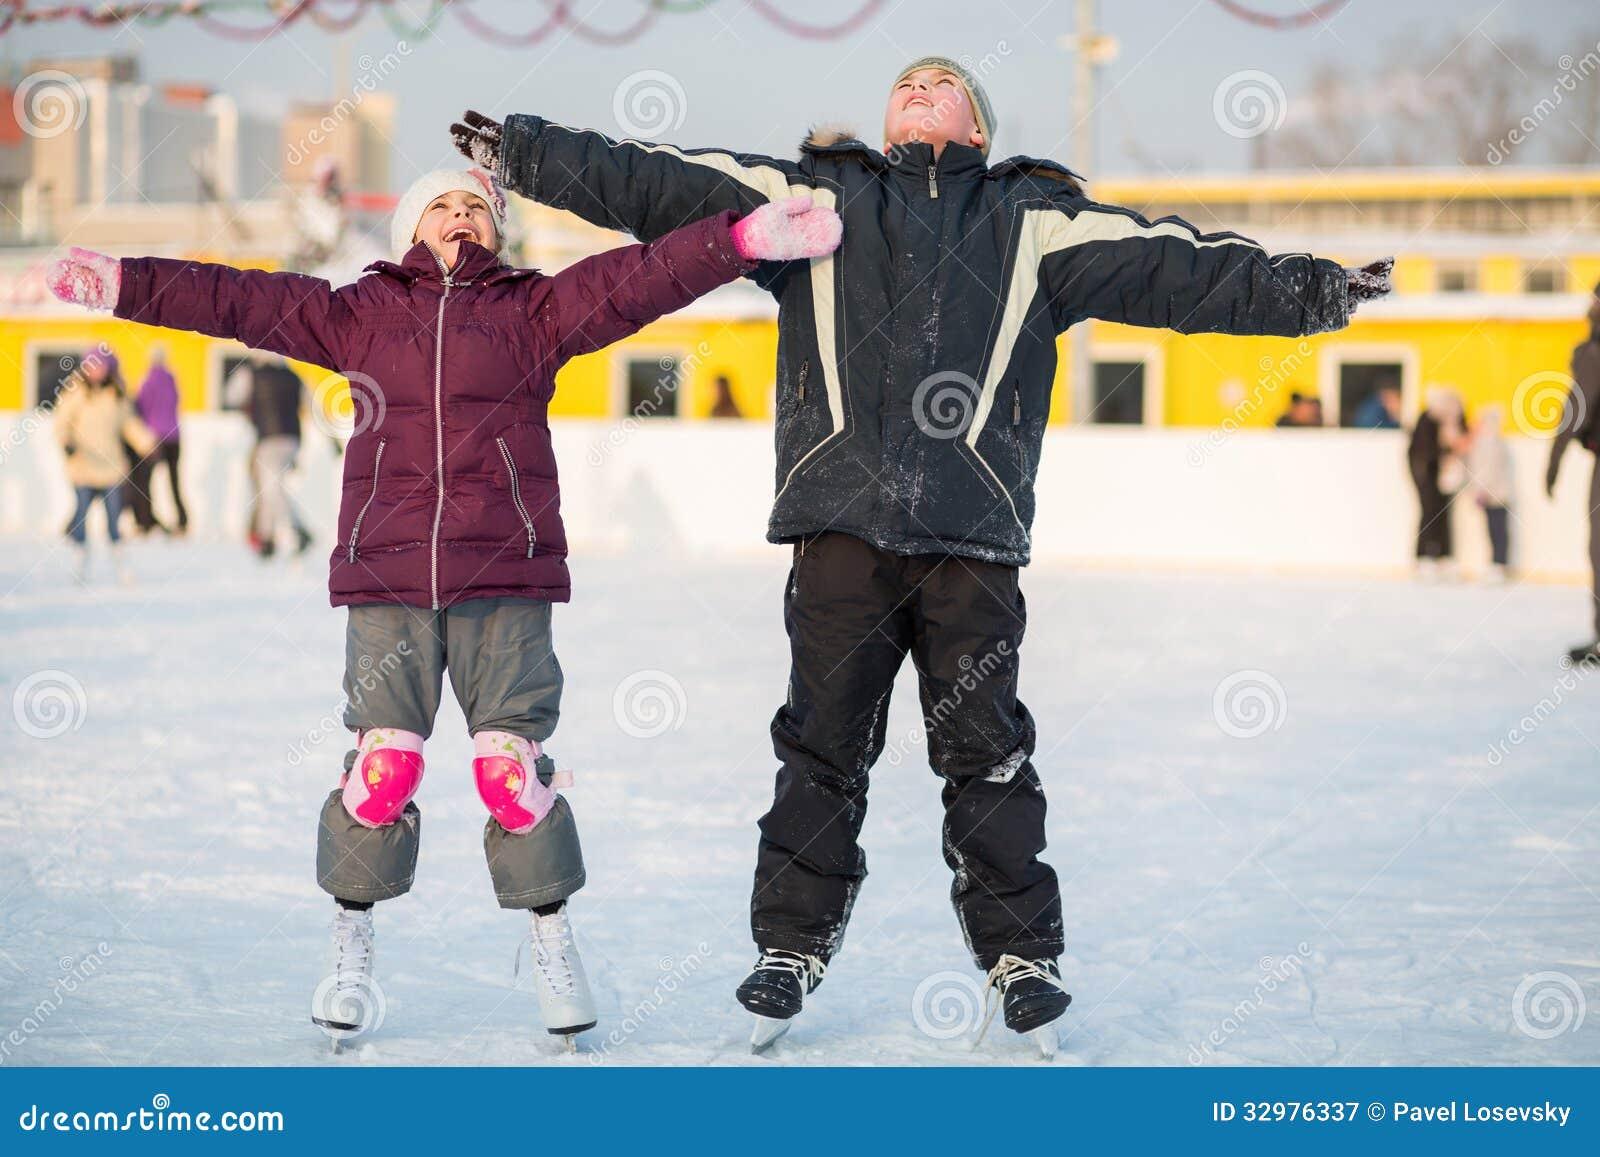 Boy and girl skating on rink